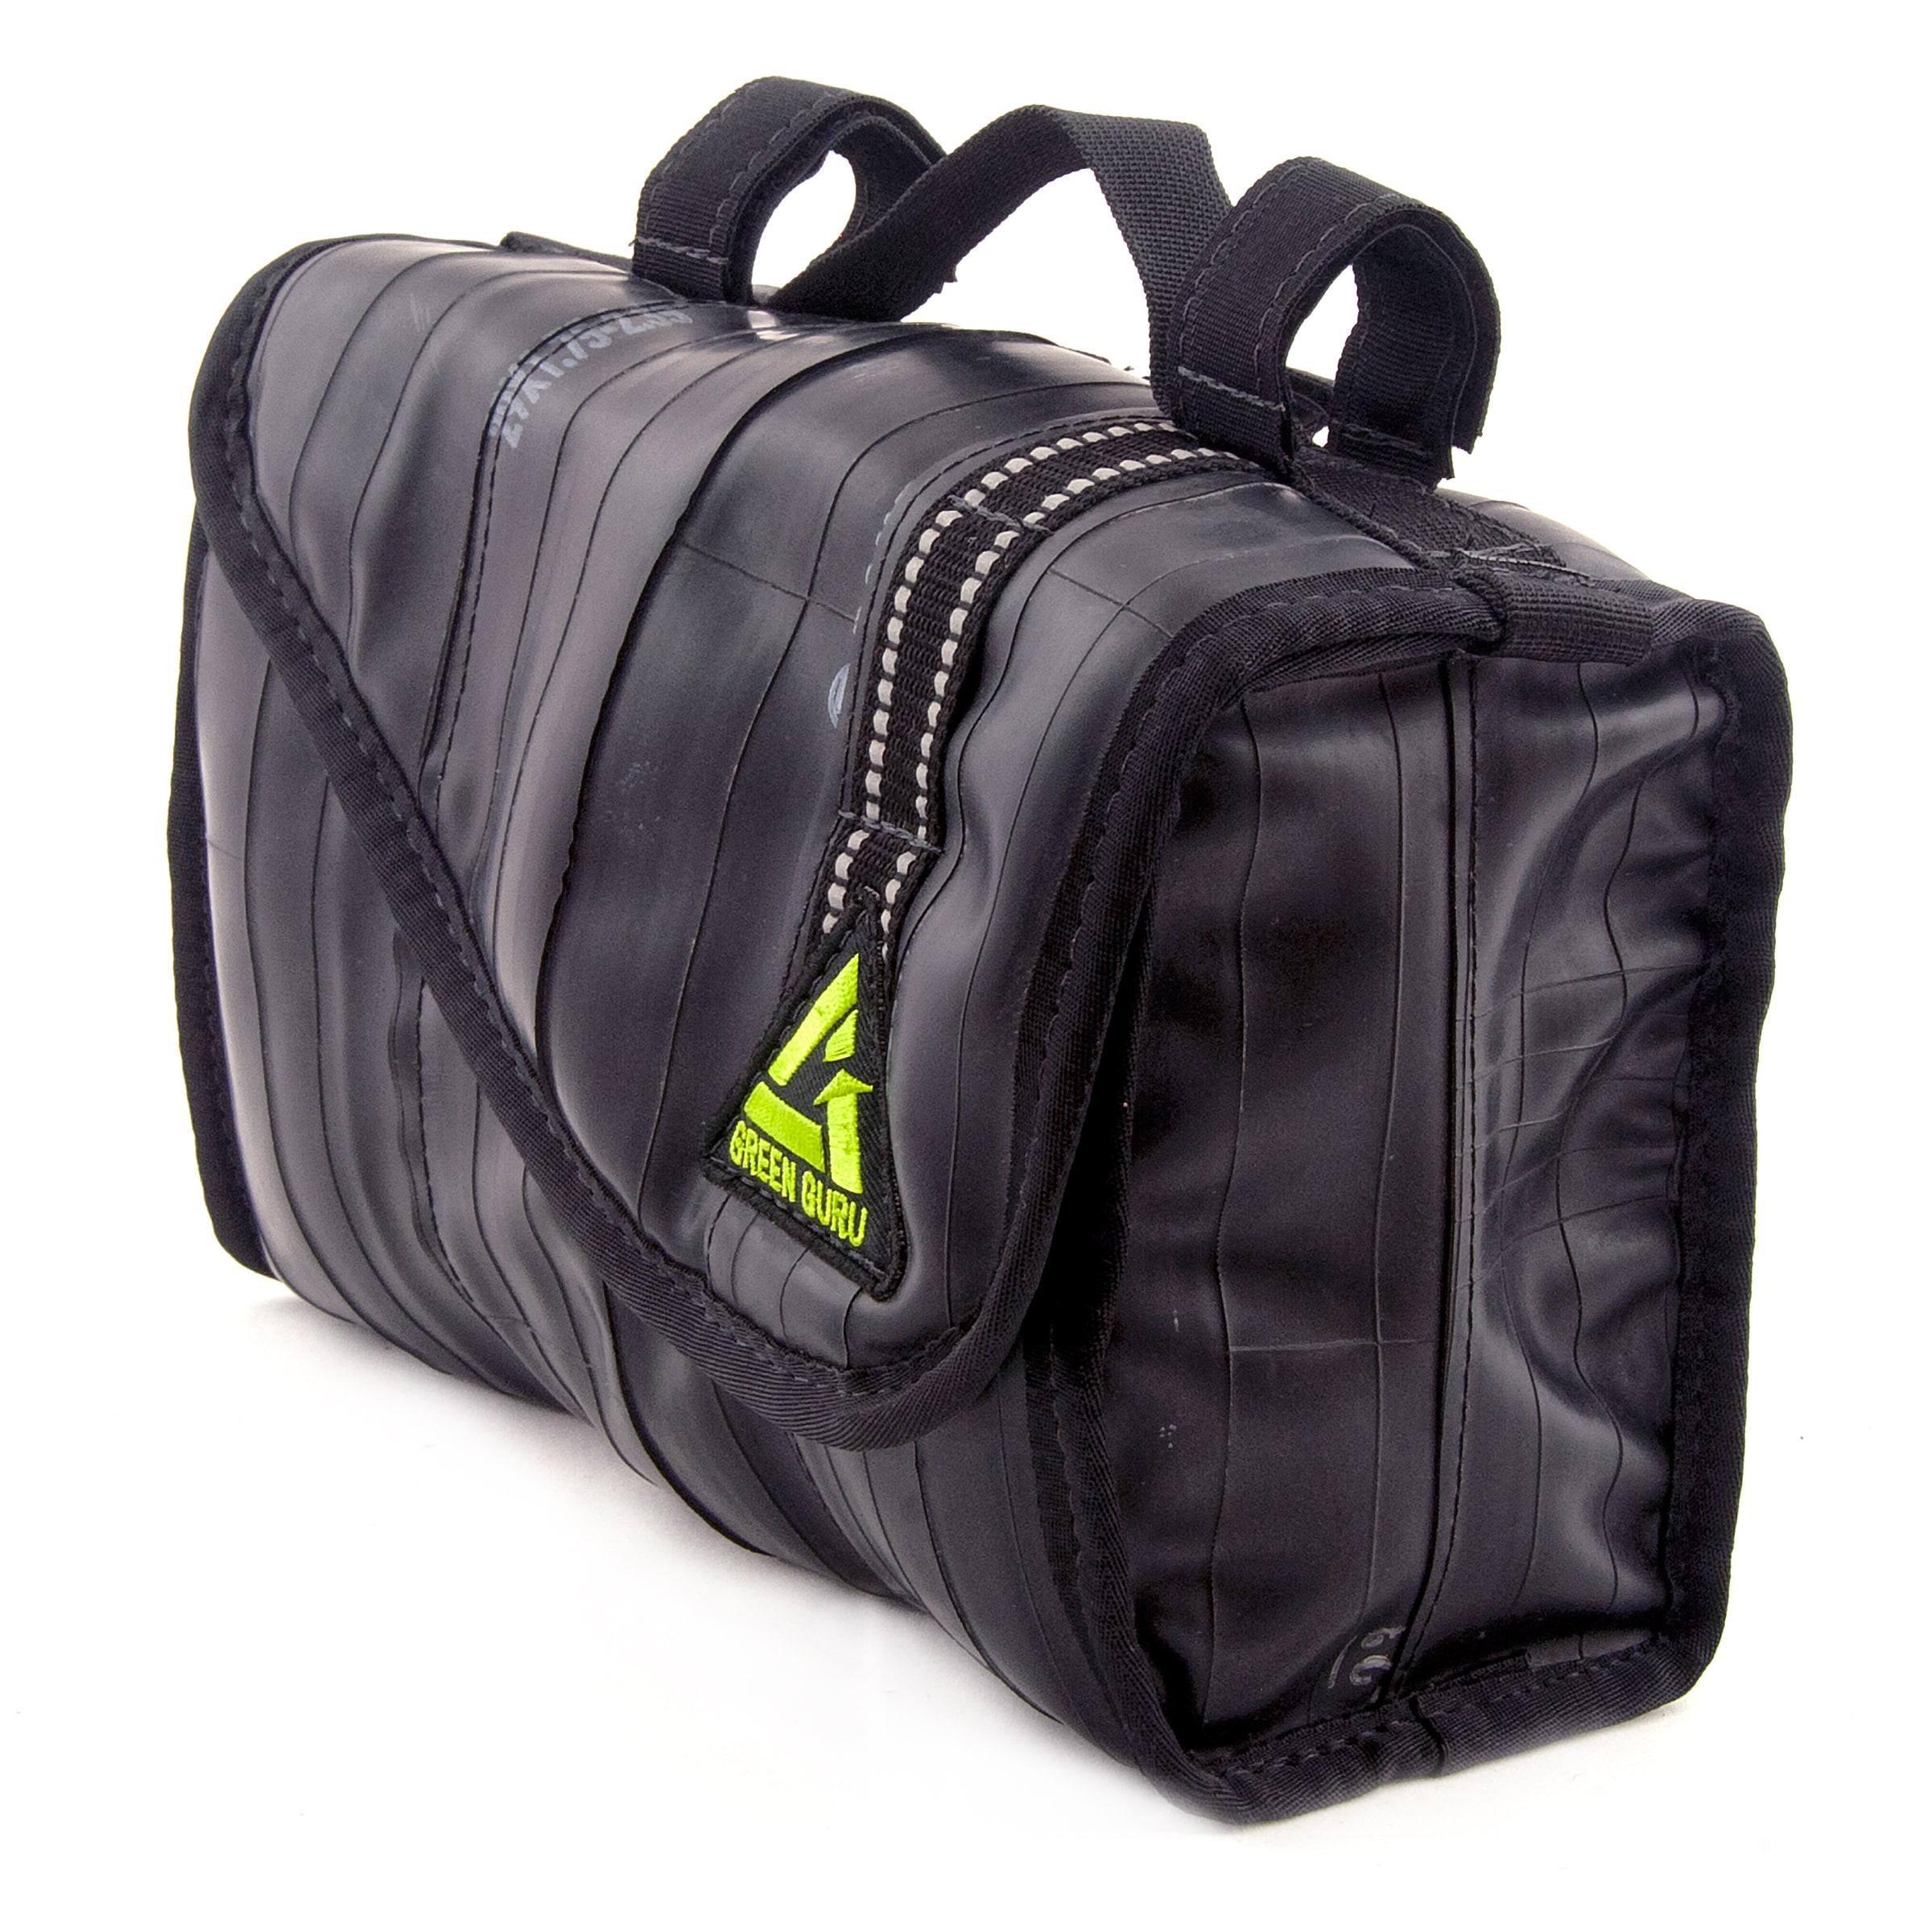 Insulated Recyled-material Cruiser Cooler Bike Tube Handlebar Bag